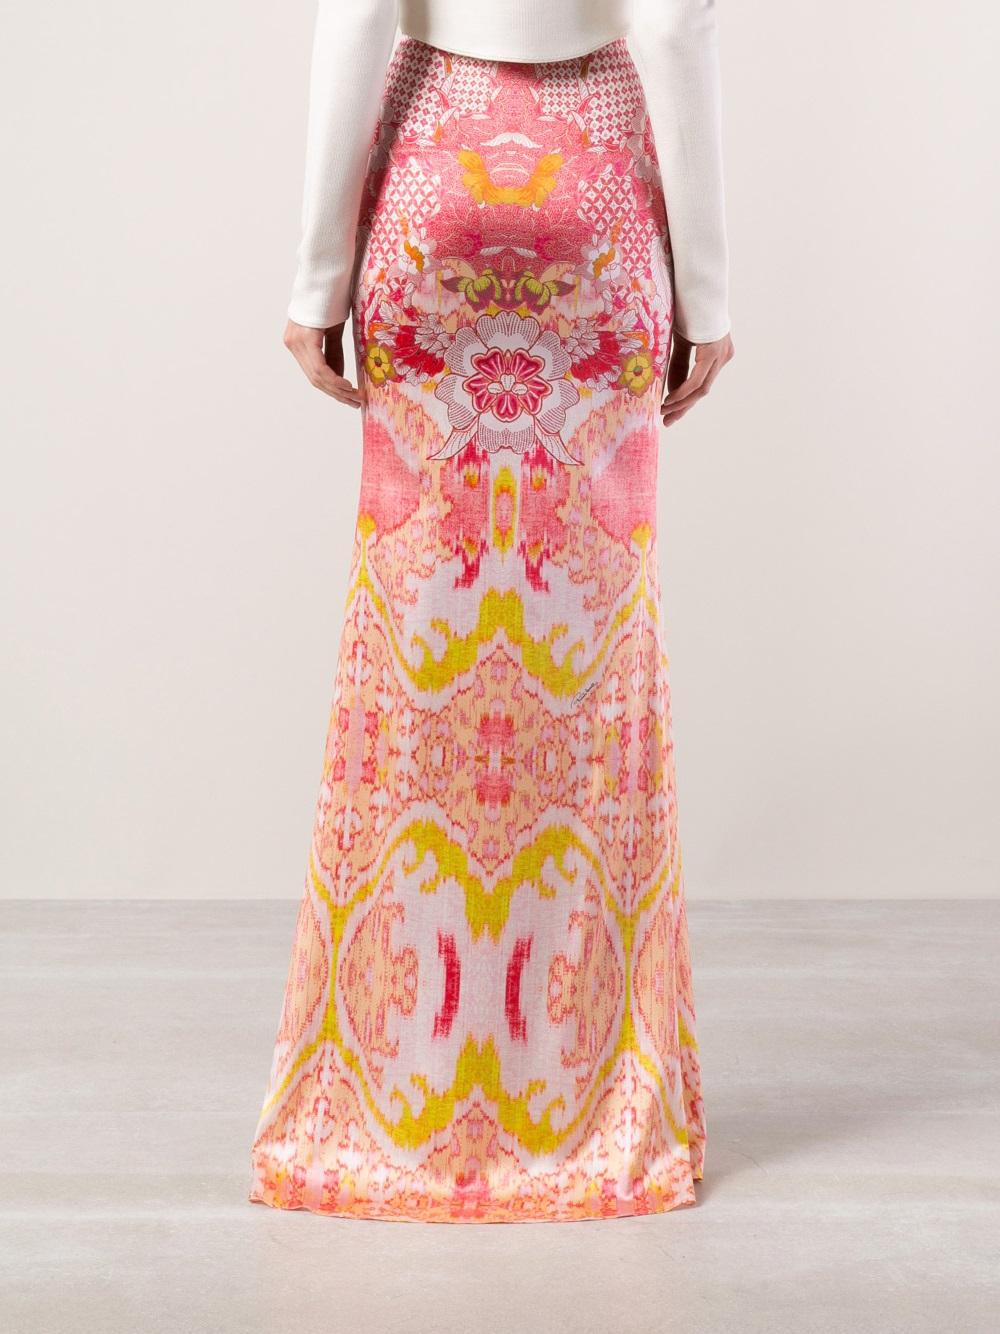 63e7d9eeb9 Lyst - Roberto Cavalli Floral Print Maxi Skirt in Pink